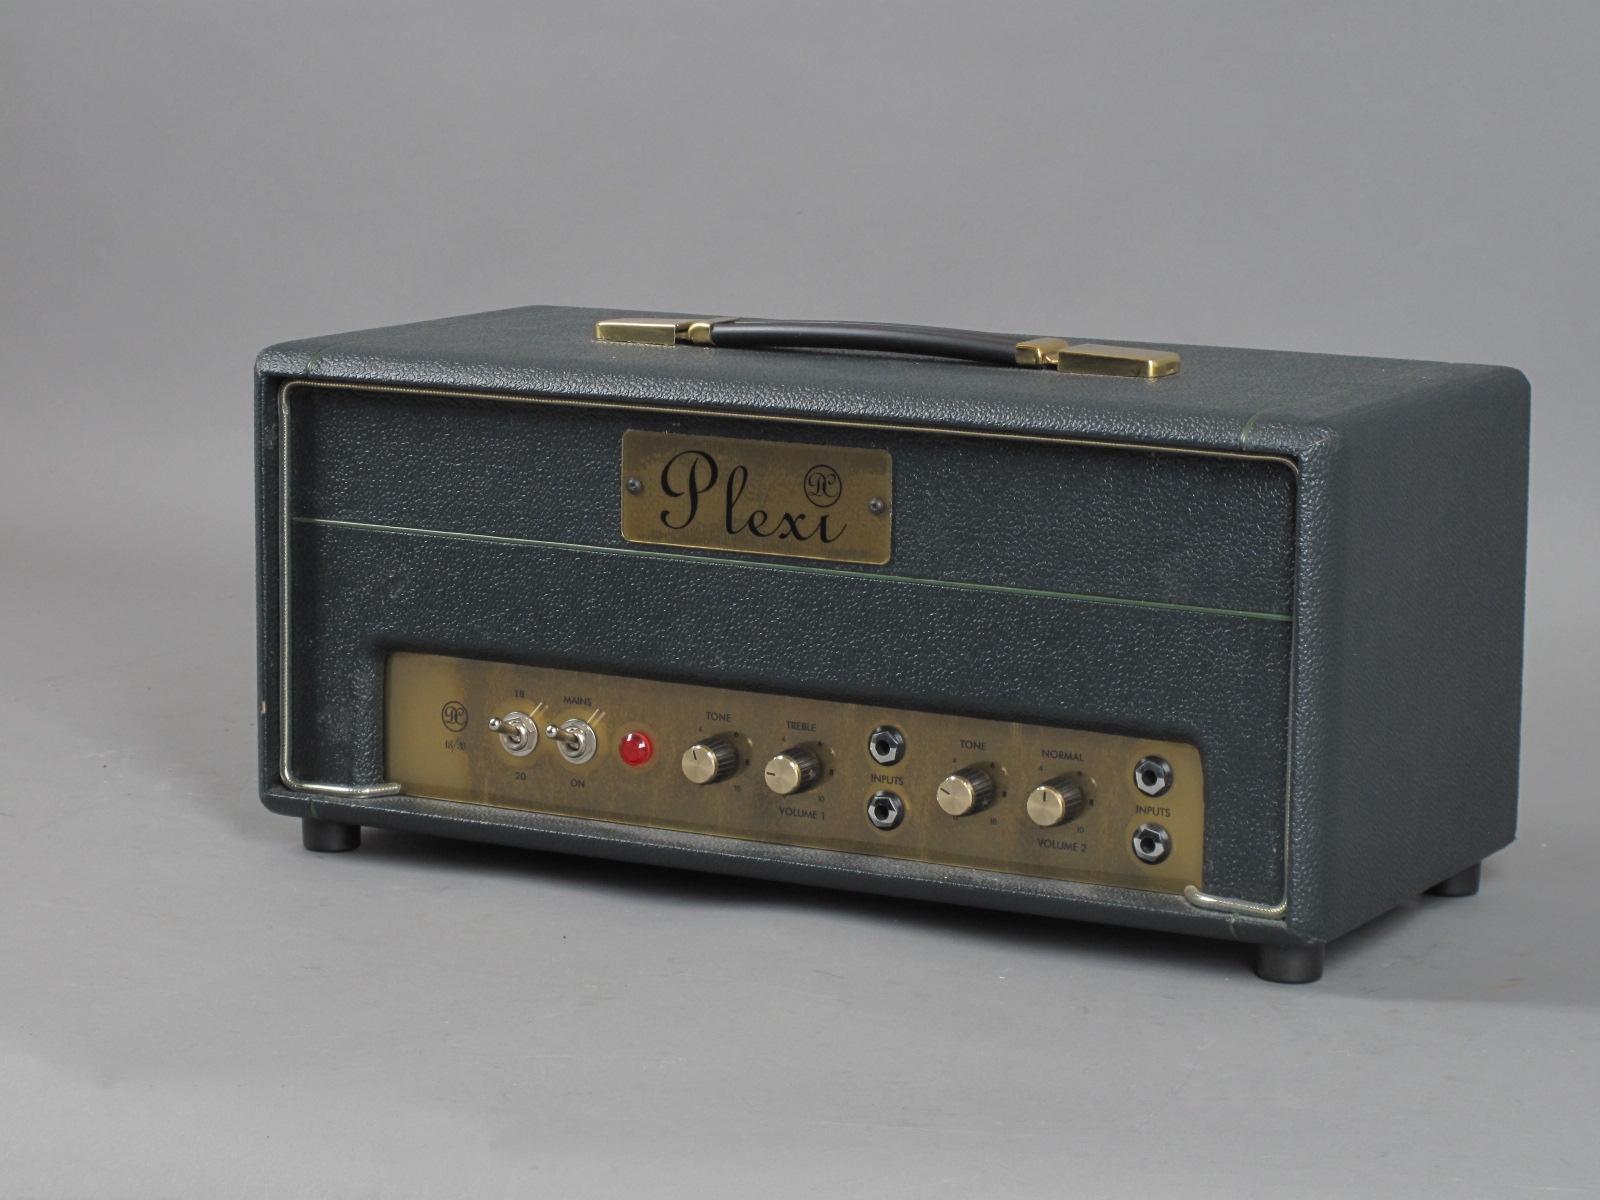 https://guitarpoint.de/app/uploads/products/2000s-plexi-dc-18-20-early-cornell/2000-Plexi-DC-18-20-0007_2.jpg